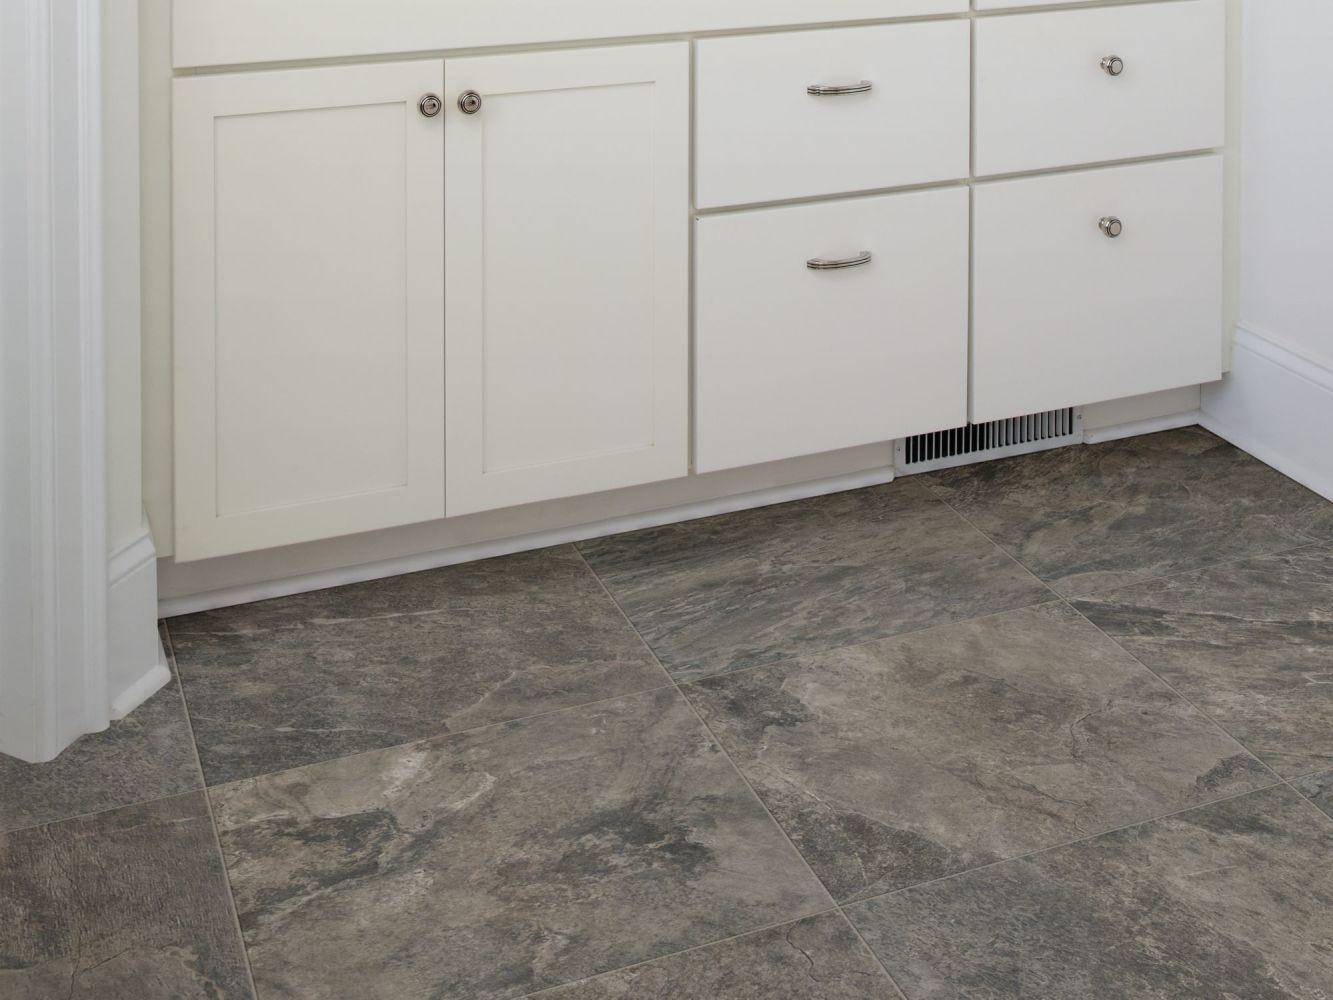 Shaw Floors Home Fn Gold Ceramic Delphi 12×24 Ash 00550_TG13A